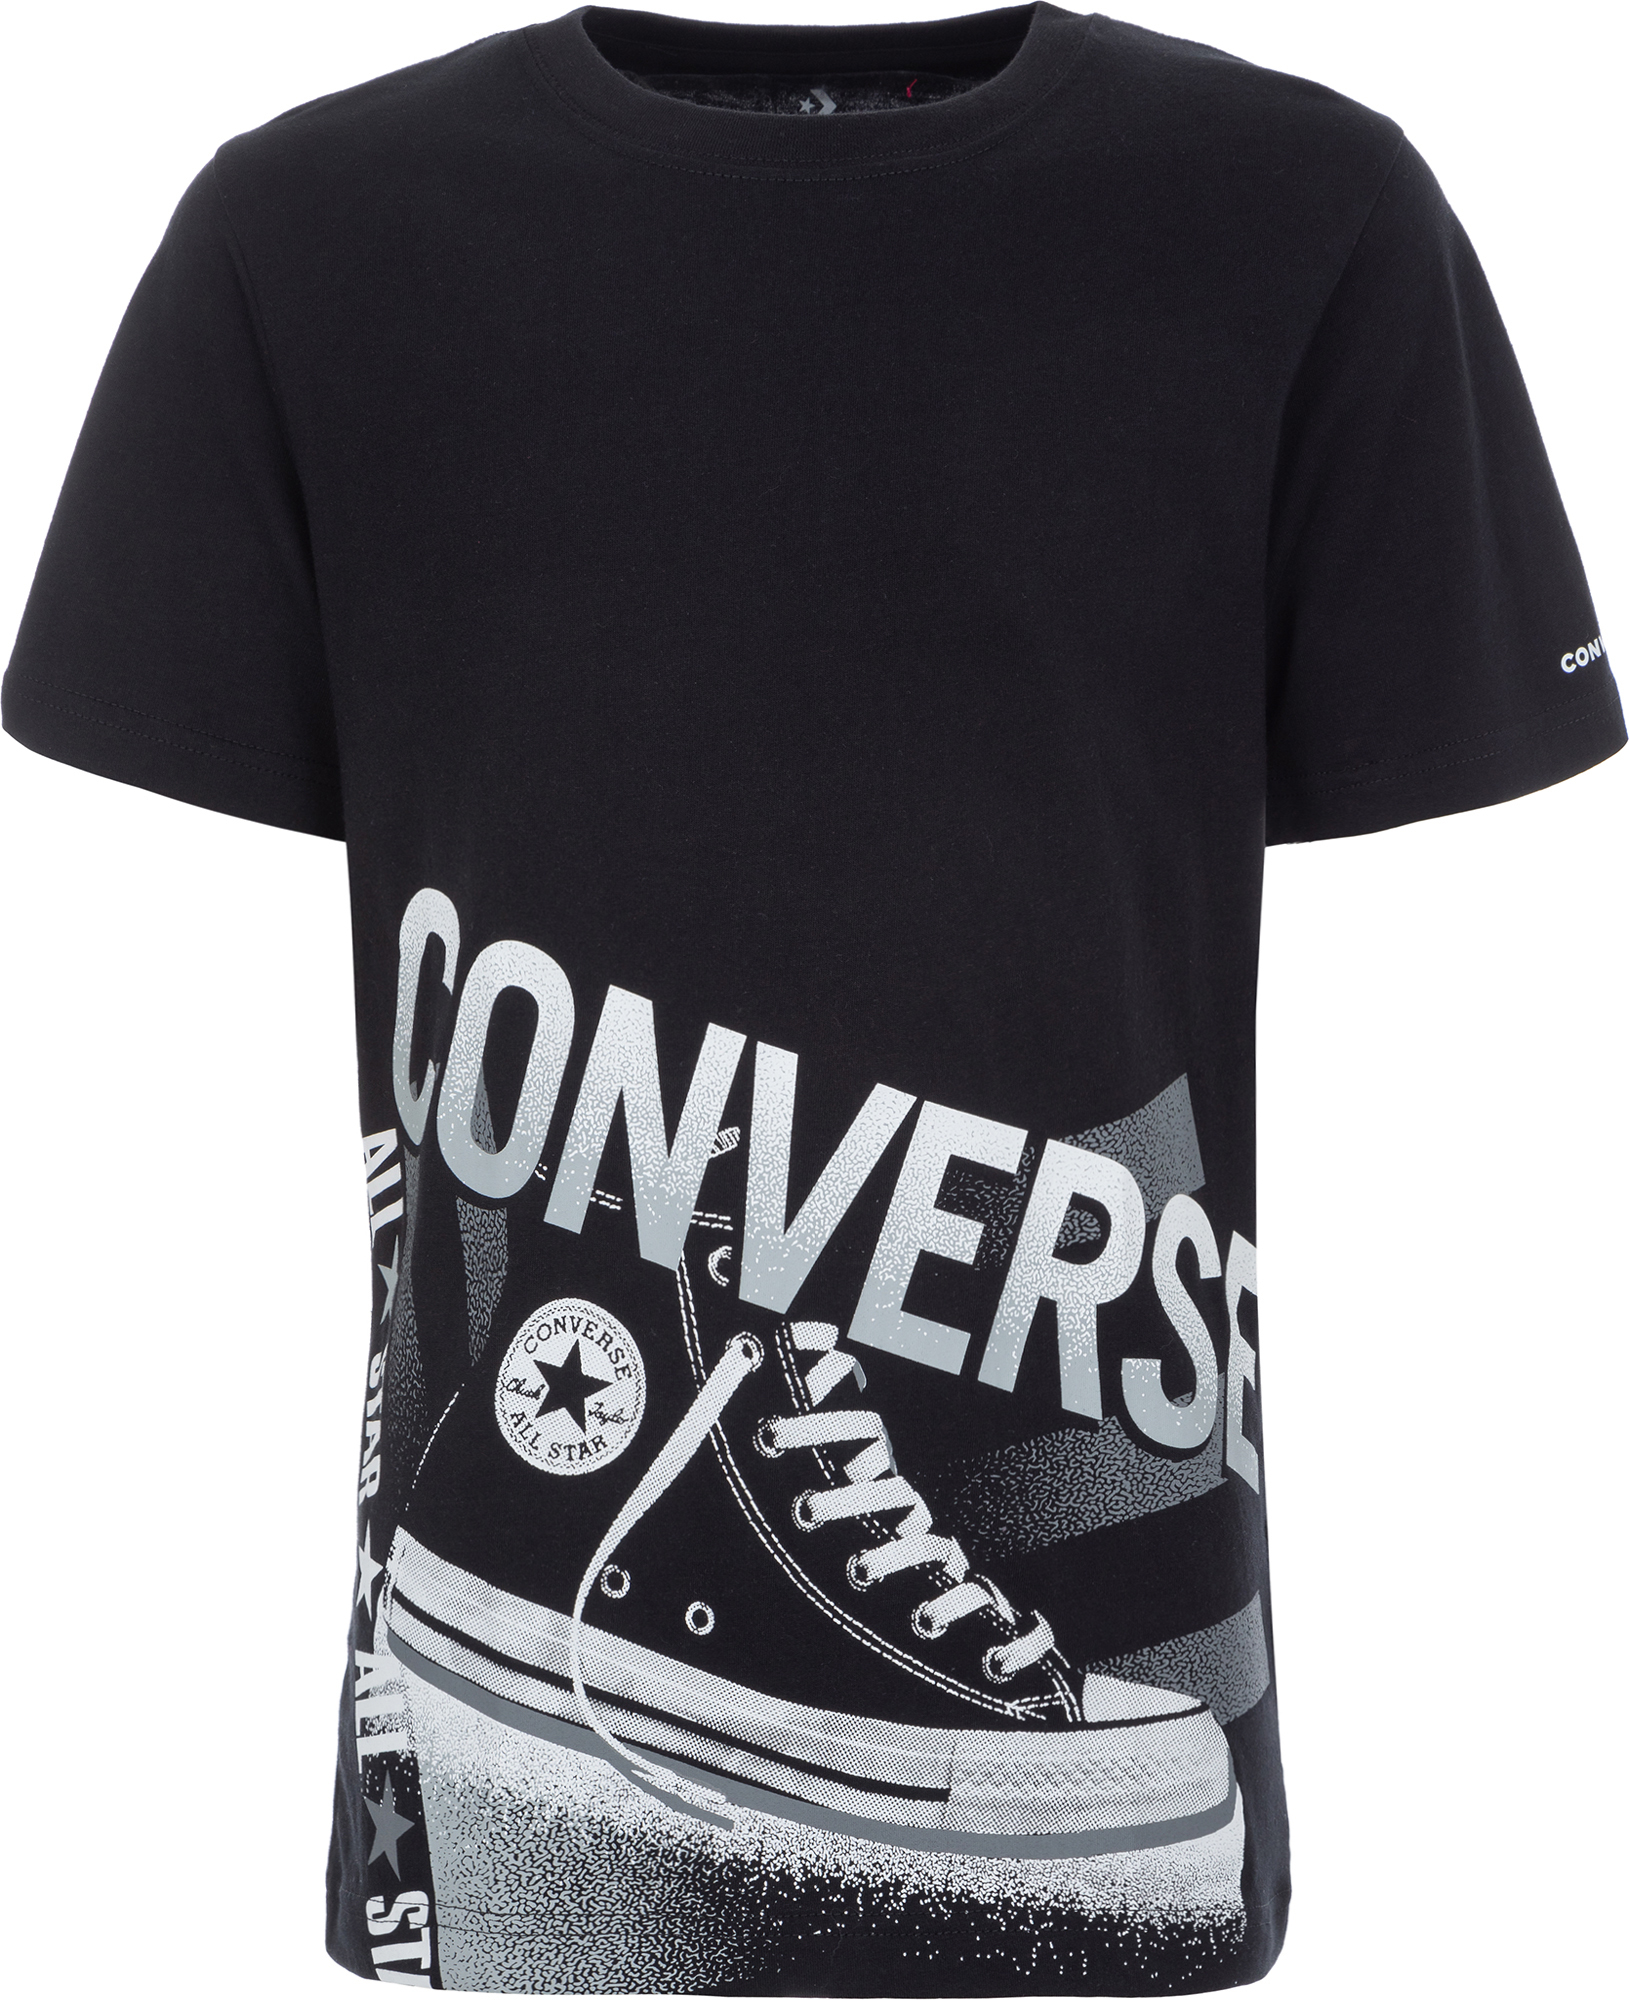 Converse Футболка для мальчиков Converse Chuck, размер 164